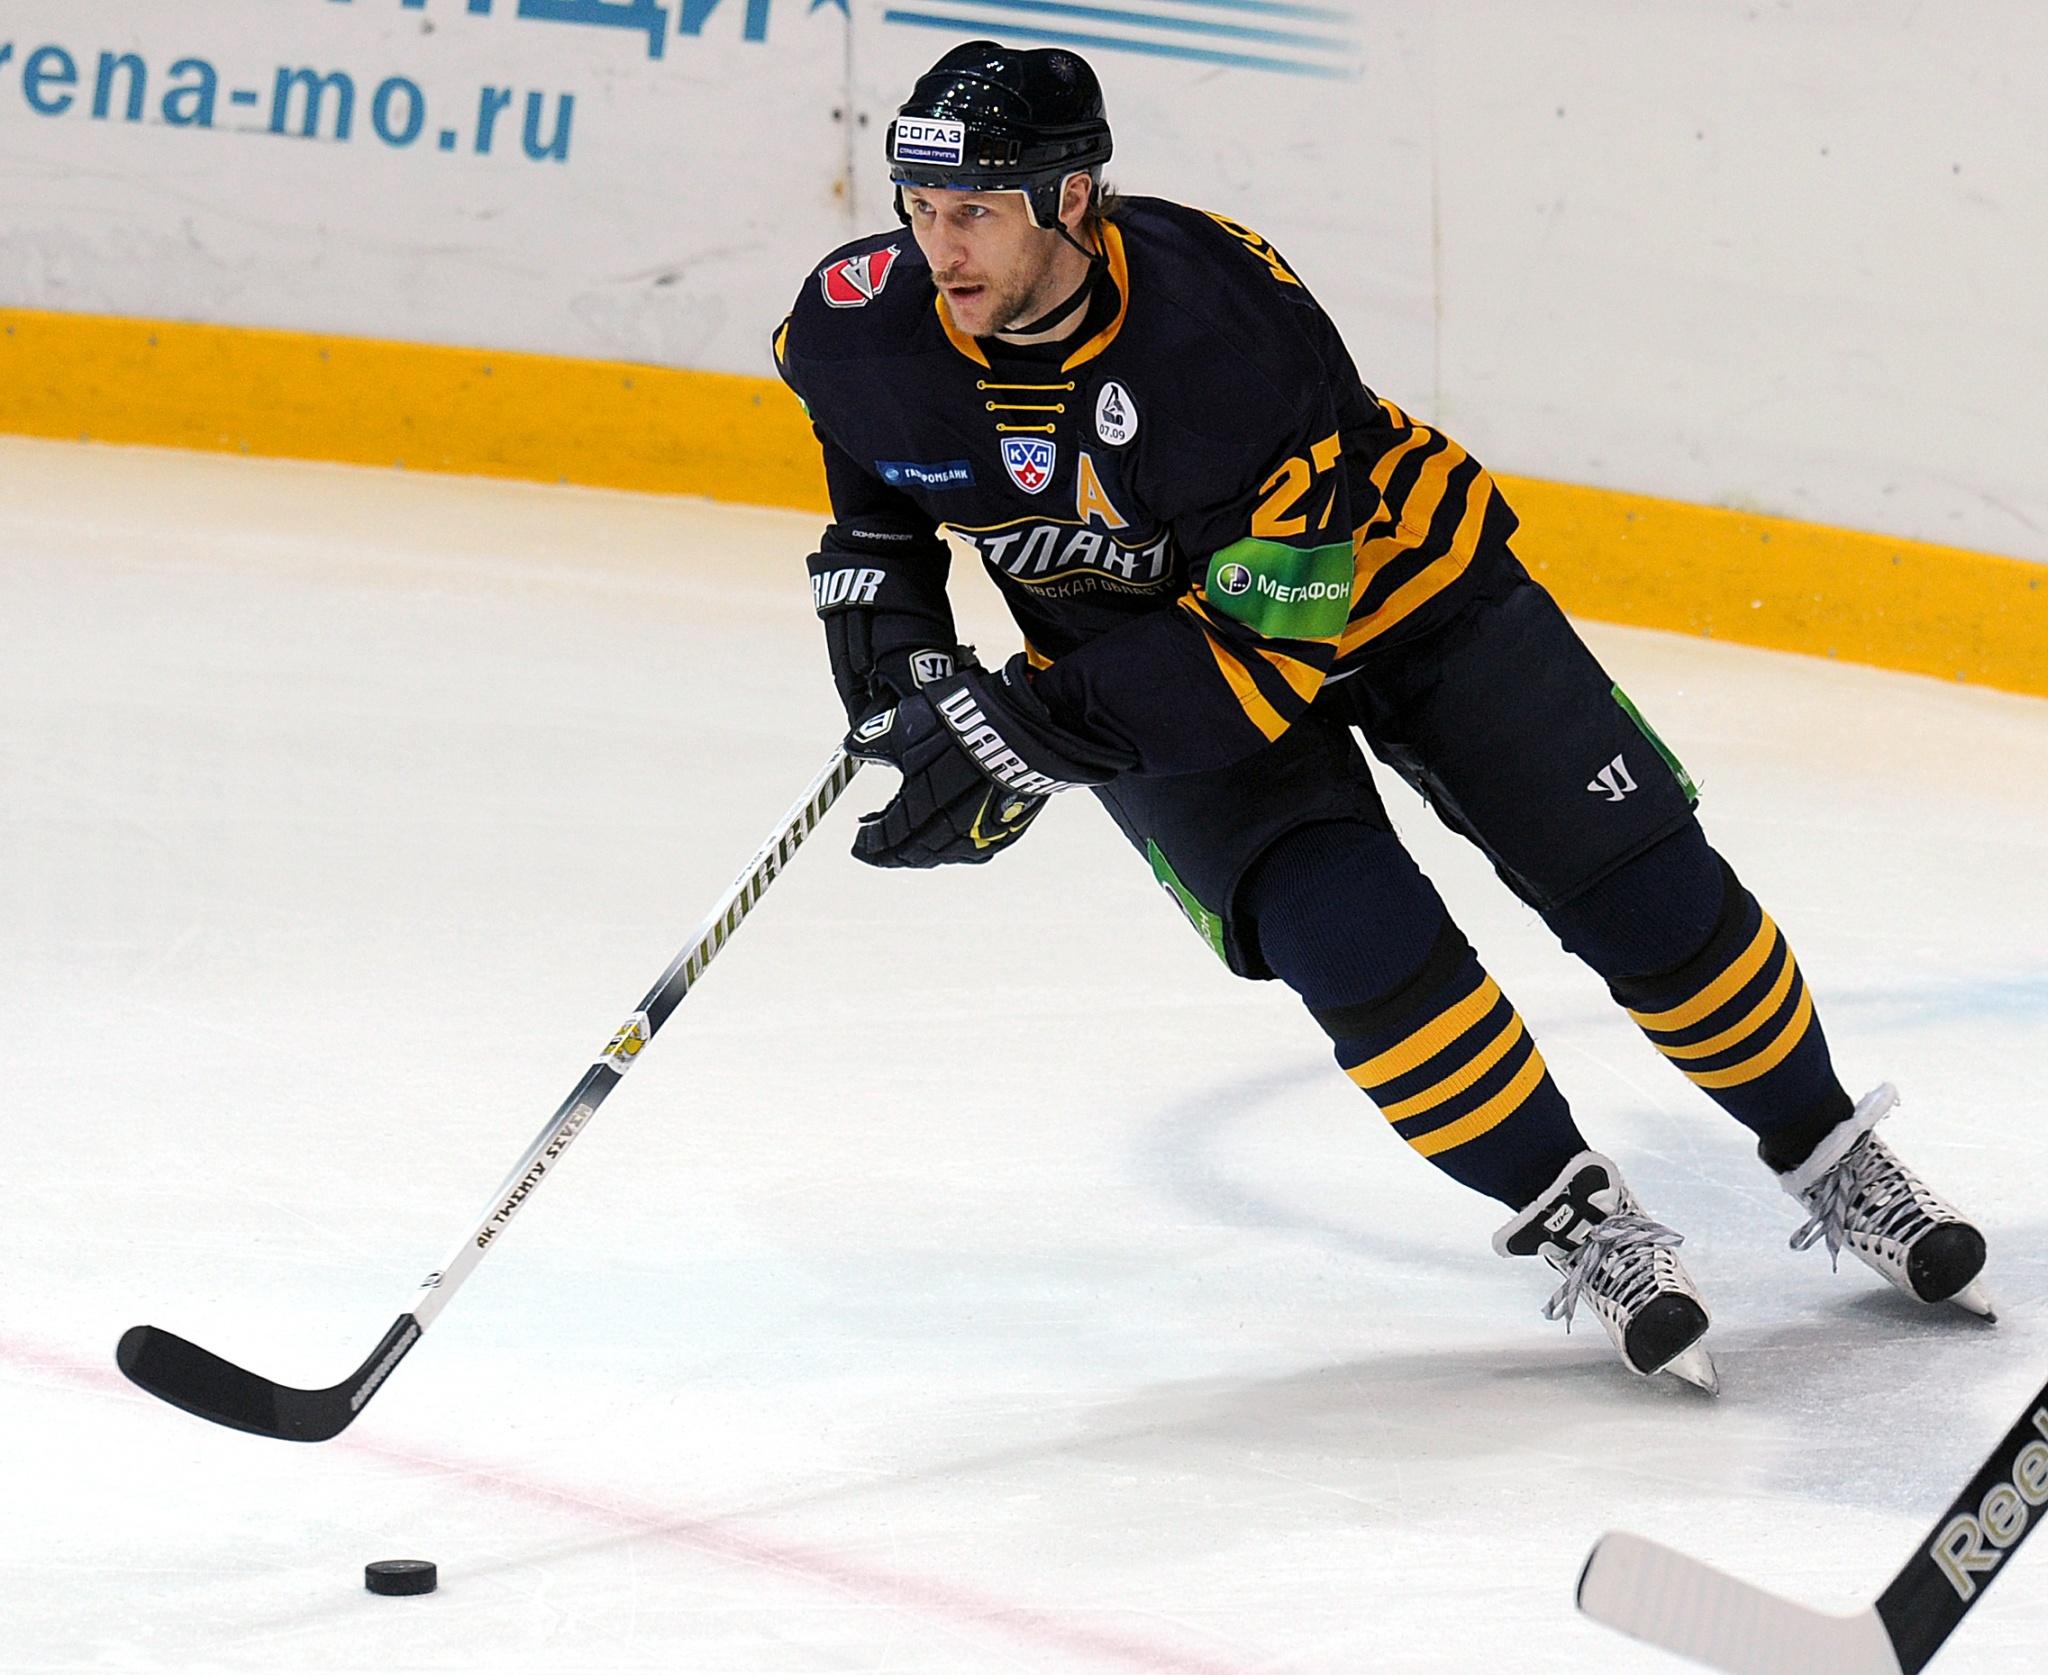 Алексей Ковалев. Фото: Юрий Кузьмин